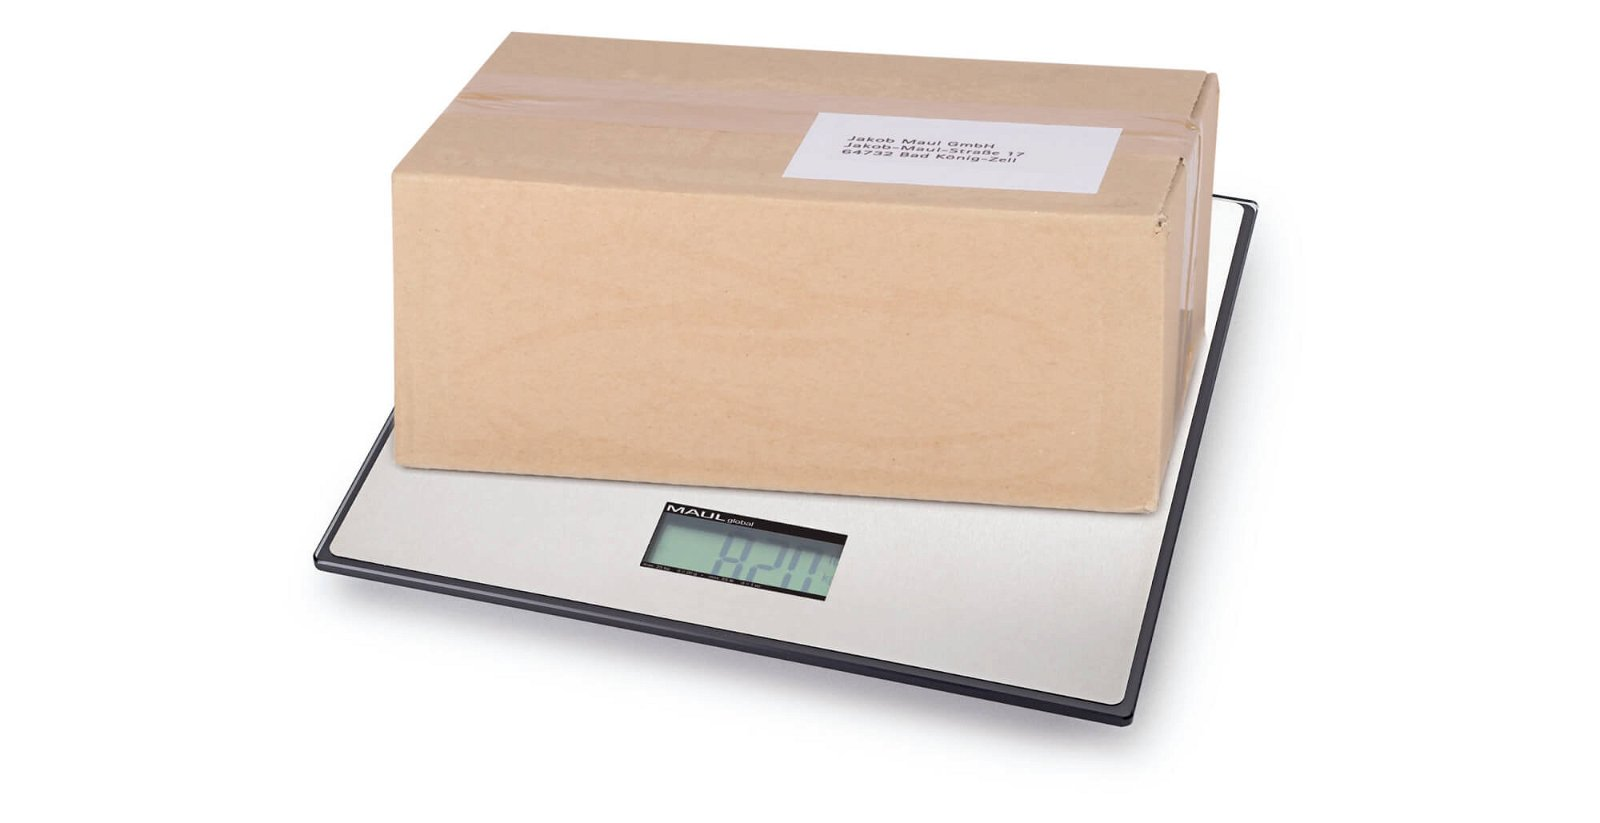 Paketwaage MAULglobal, 25 kg, schwarz